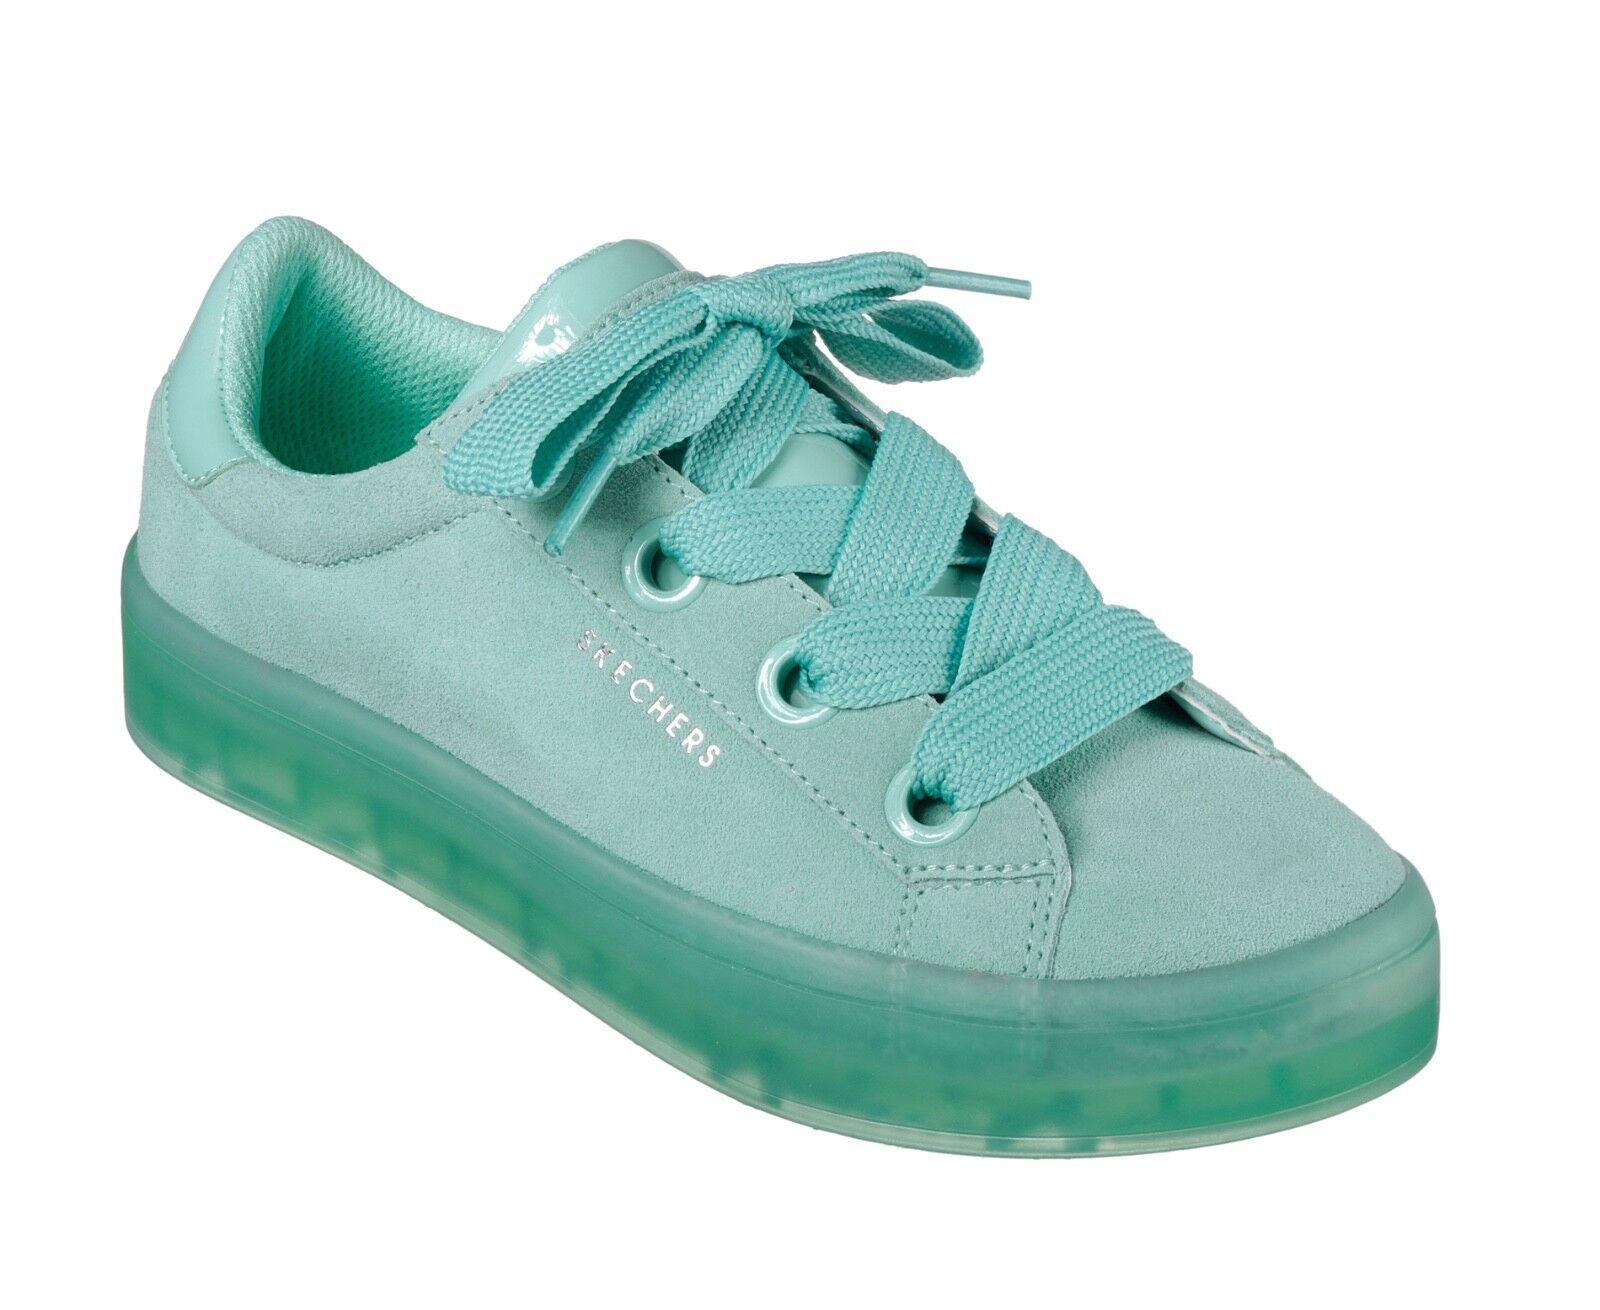 Skechers Street NEW Hi Lites Suede City Aqua 3-8 mint fashion trainers Größes 3-8 Aqua 4a66a9